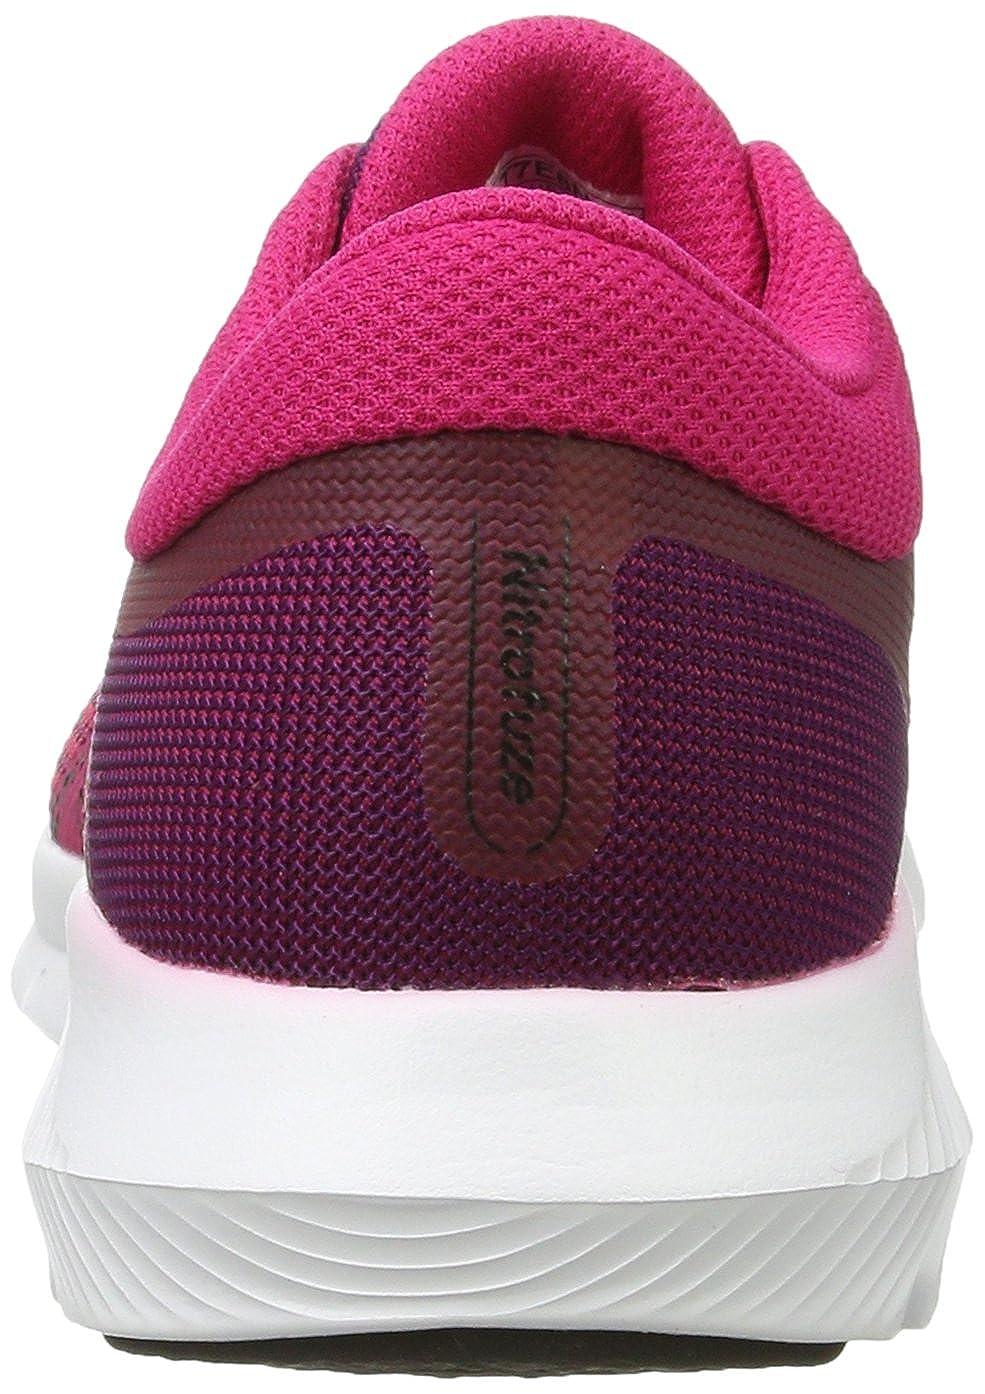 ASICS Damen Nitrofuze 2 Laufschuhe, Rose Corail Blanc Pink (Cosmo (Cosmo Pink Pink / schwarz / Prune) 4f8bf4